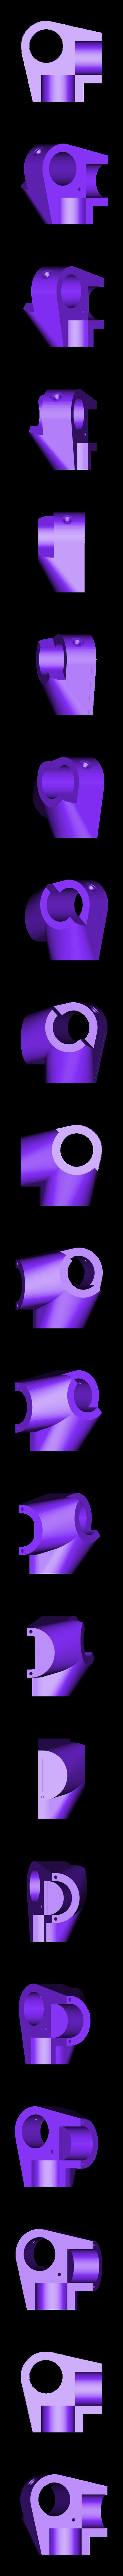 croisement V1_0.stl Download free STL file Tubes4shelves v1.0 • 3D printing model, KaptainPoiscaille